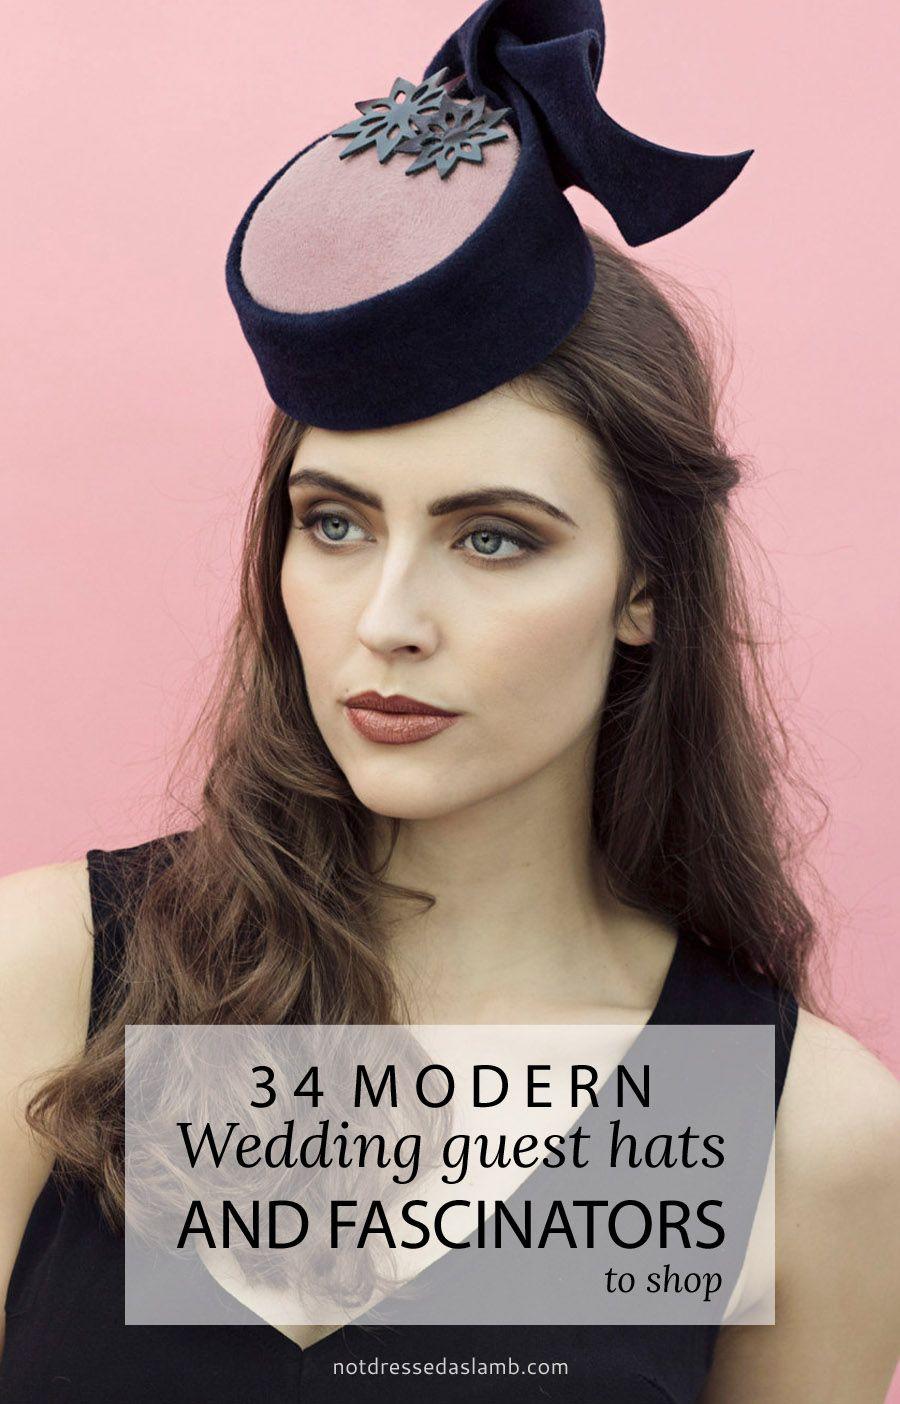 34 Modern Wedding Guest Hats and Fascinators Wedding Guest Hats 94d4a16fb80